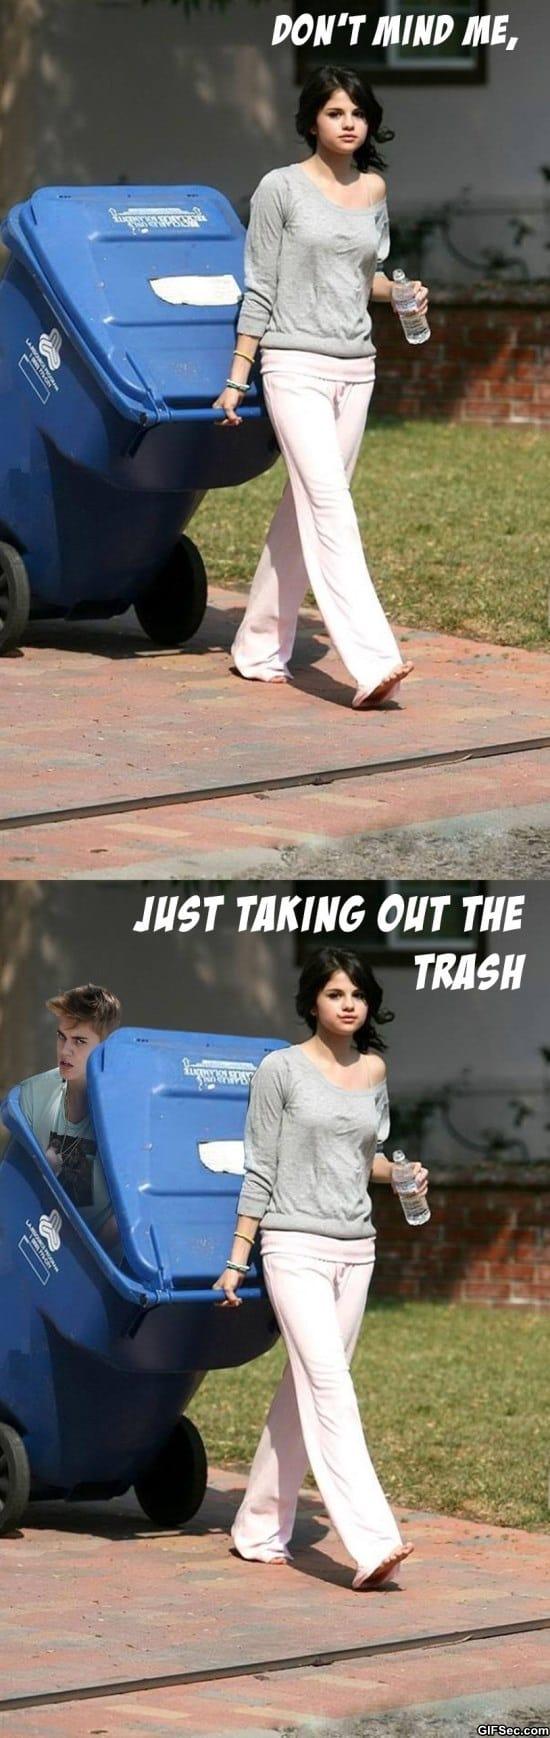 the-trash